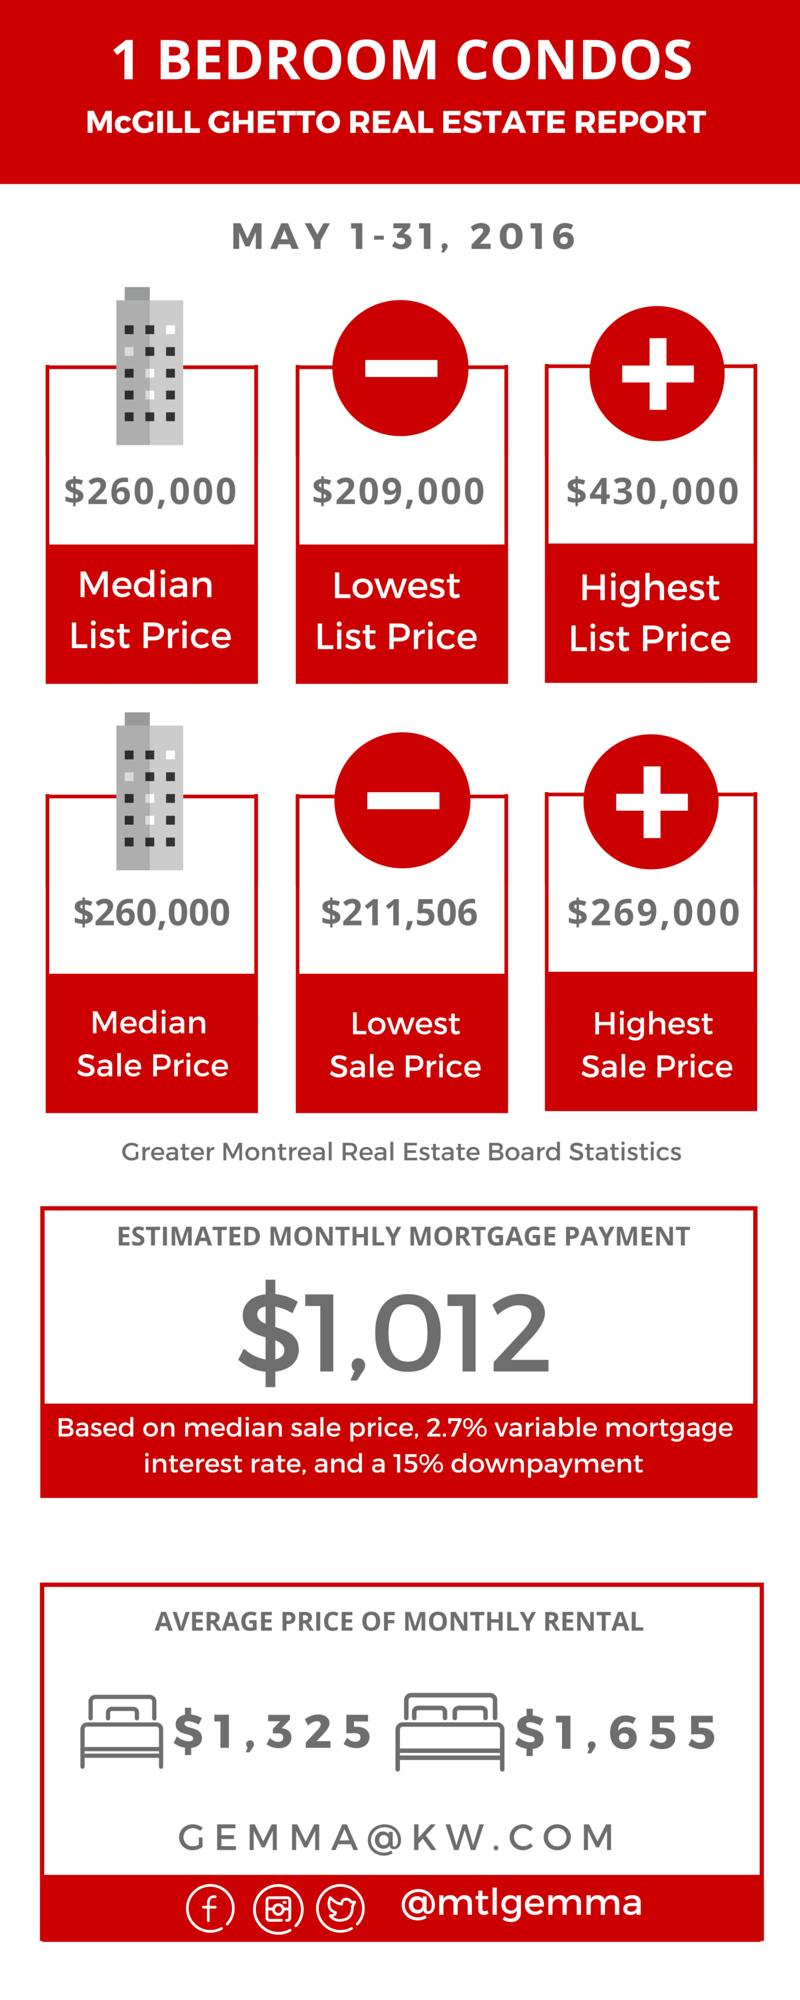 McGill Ghetto Real Estate Report May 2016 02